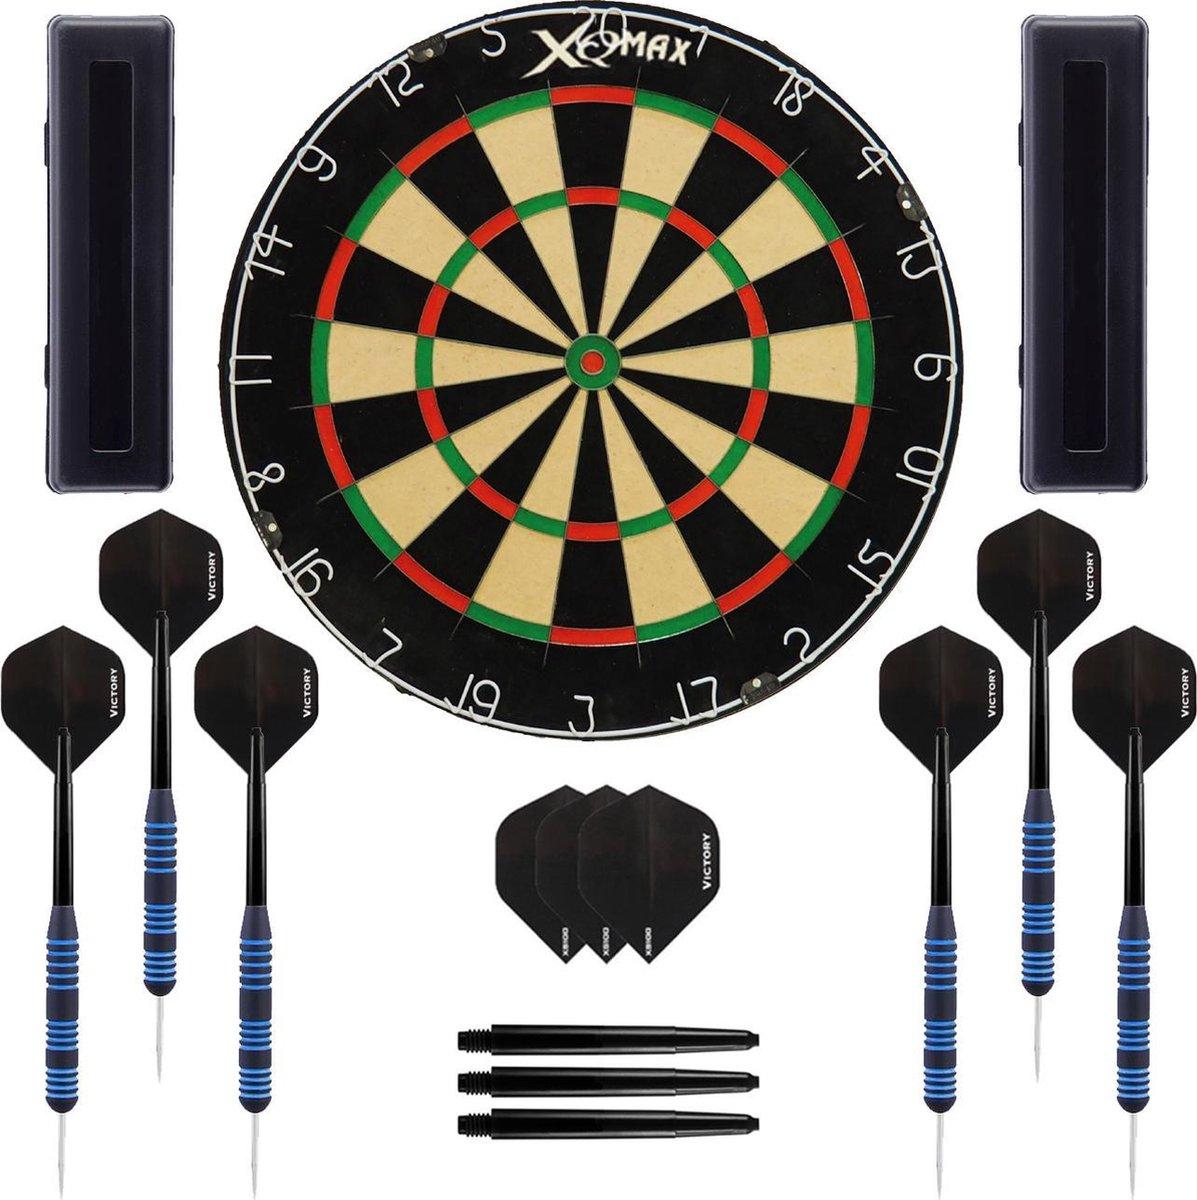 Dragon Darts Impact set - dartbord - 2 sets - dartpijlen - dart shafts - dart flights - Plain Dragon XQ dartbord